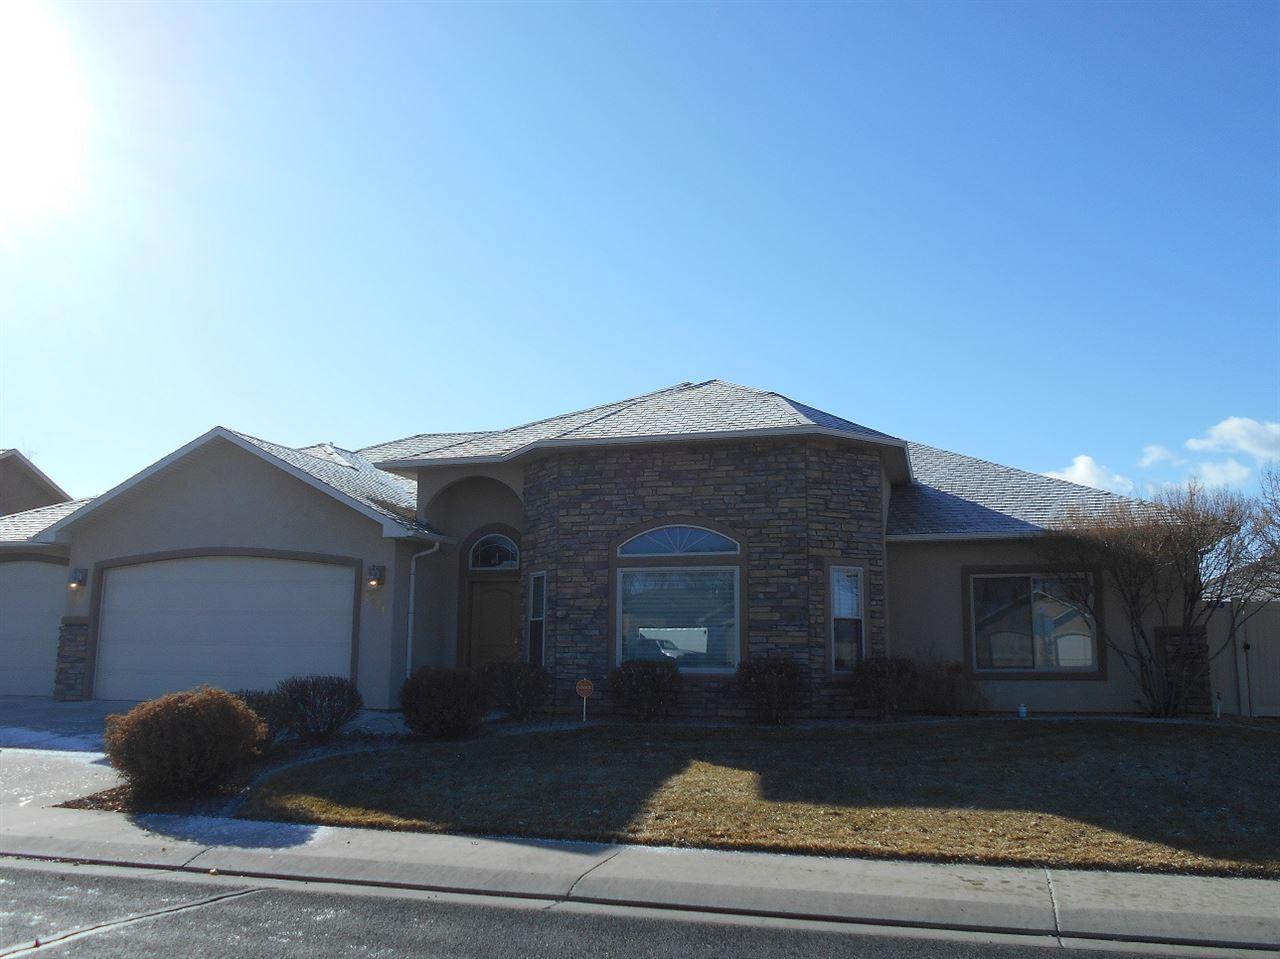 2921 River Bend Lane, Grand Junction, CO 81503